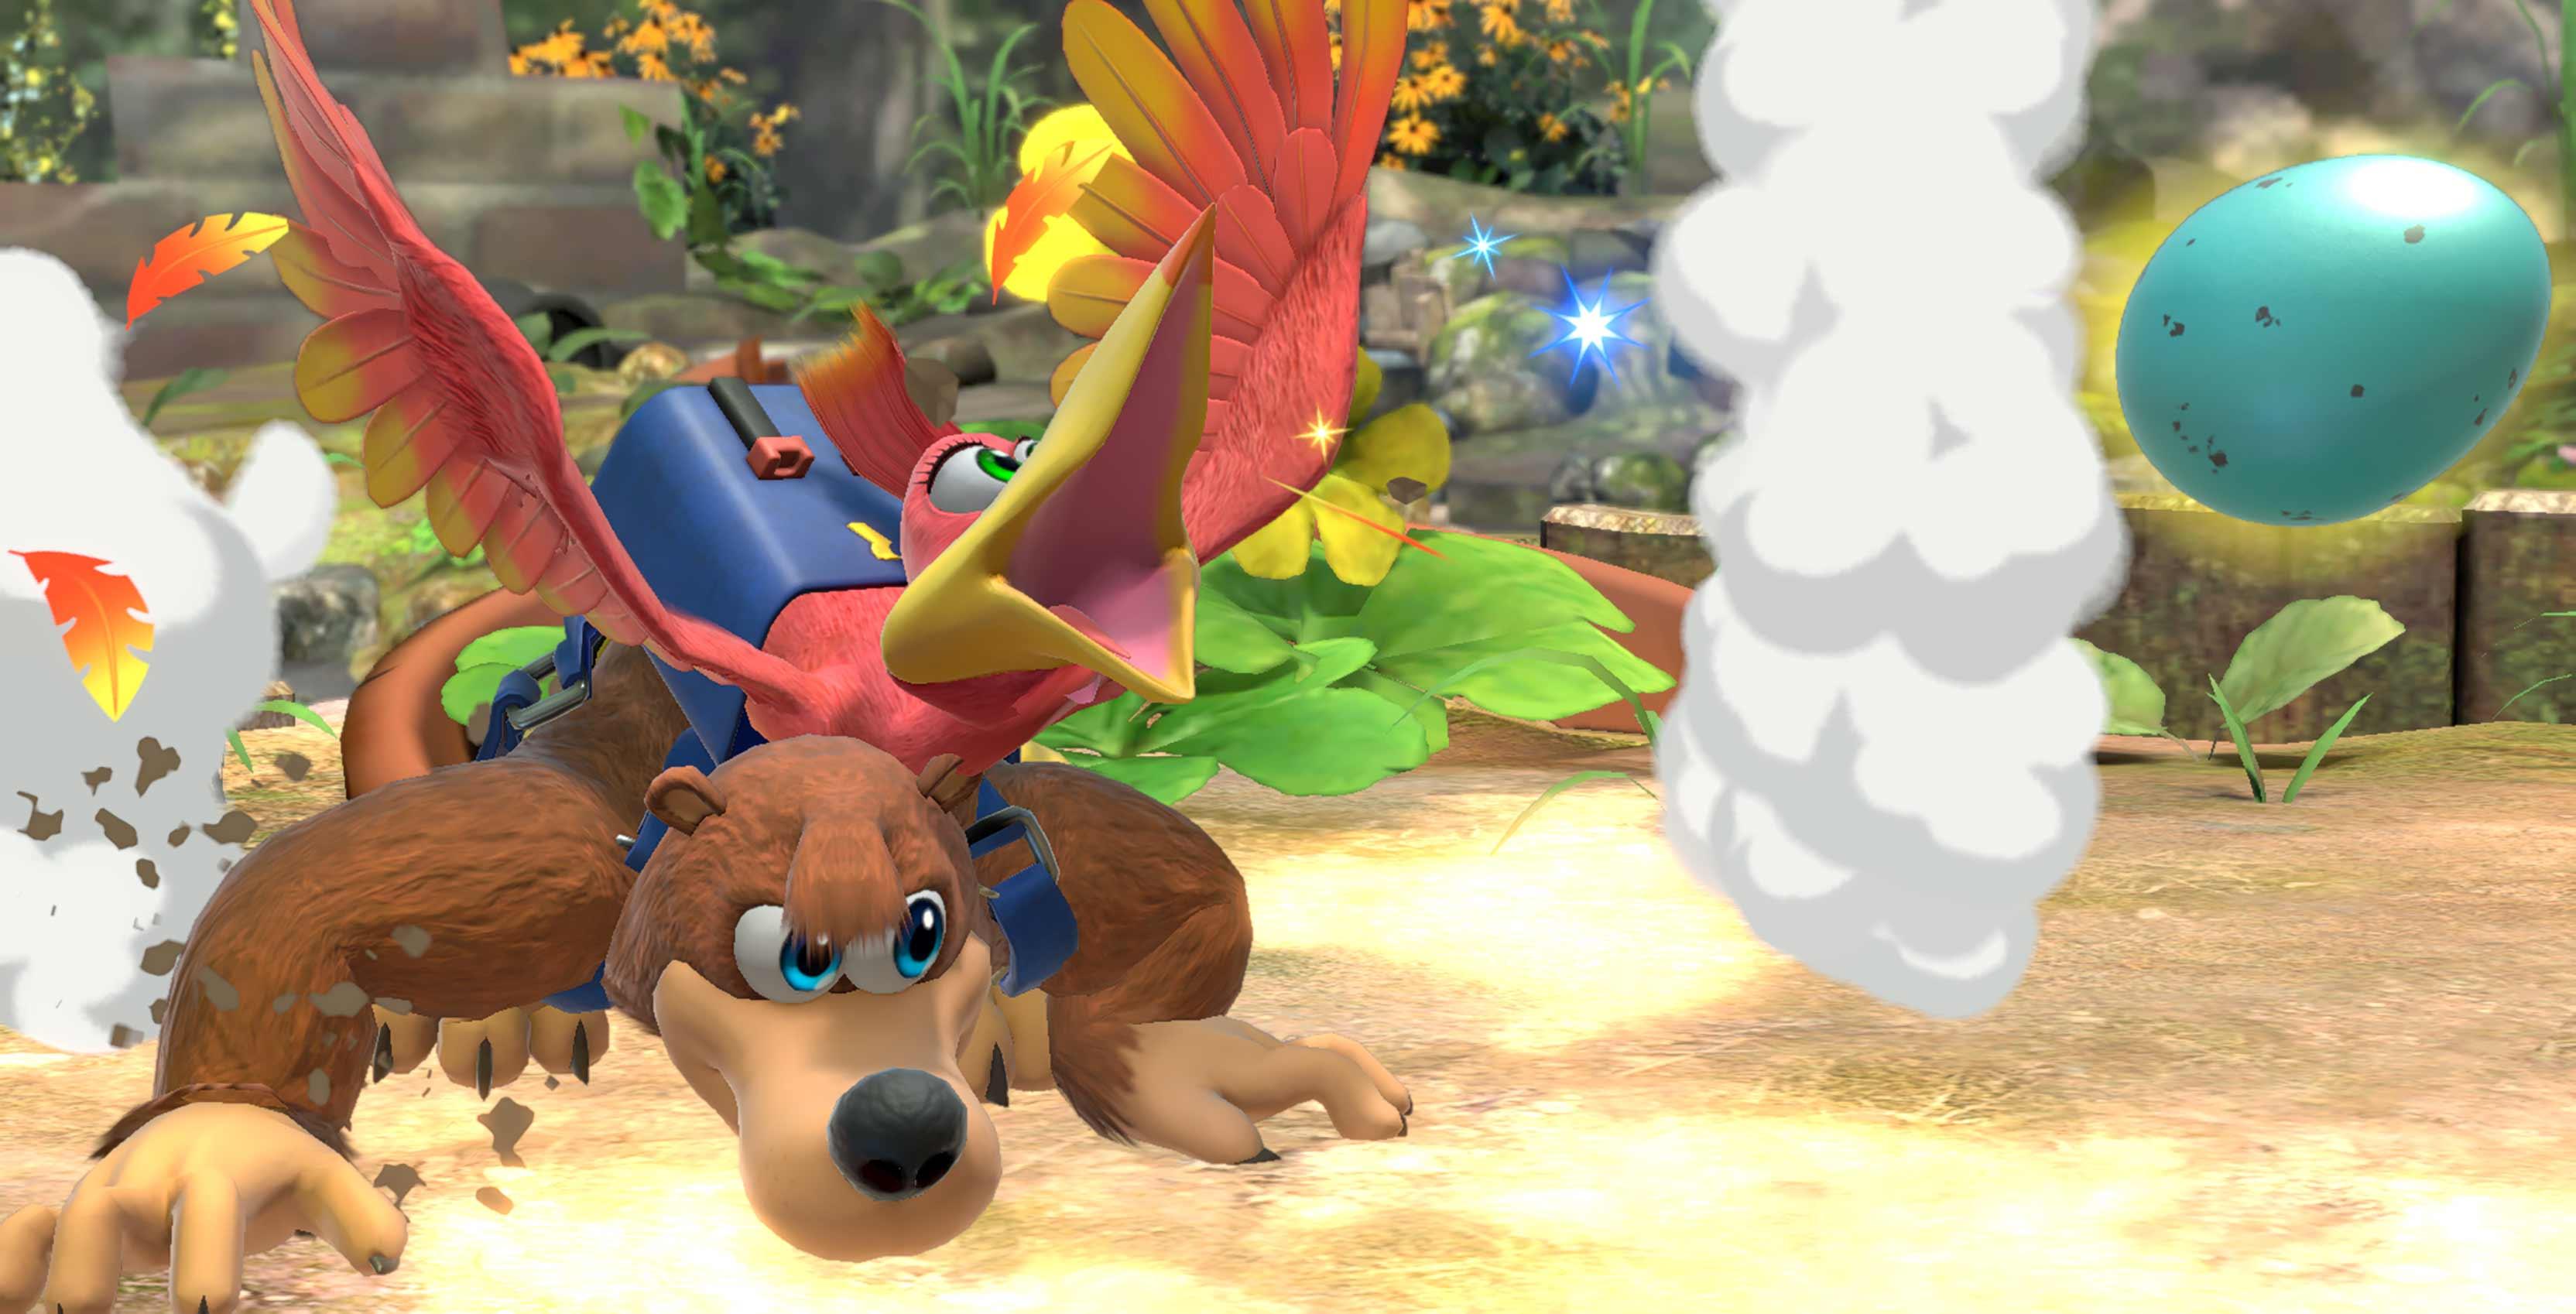 Super Smash Bros. Ultimate Banjo-Kazooie